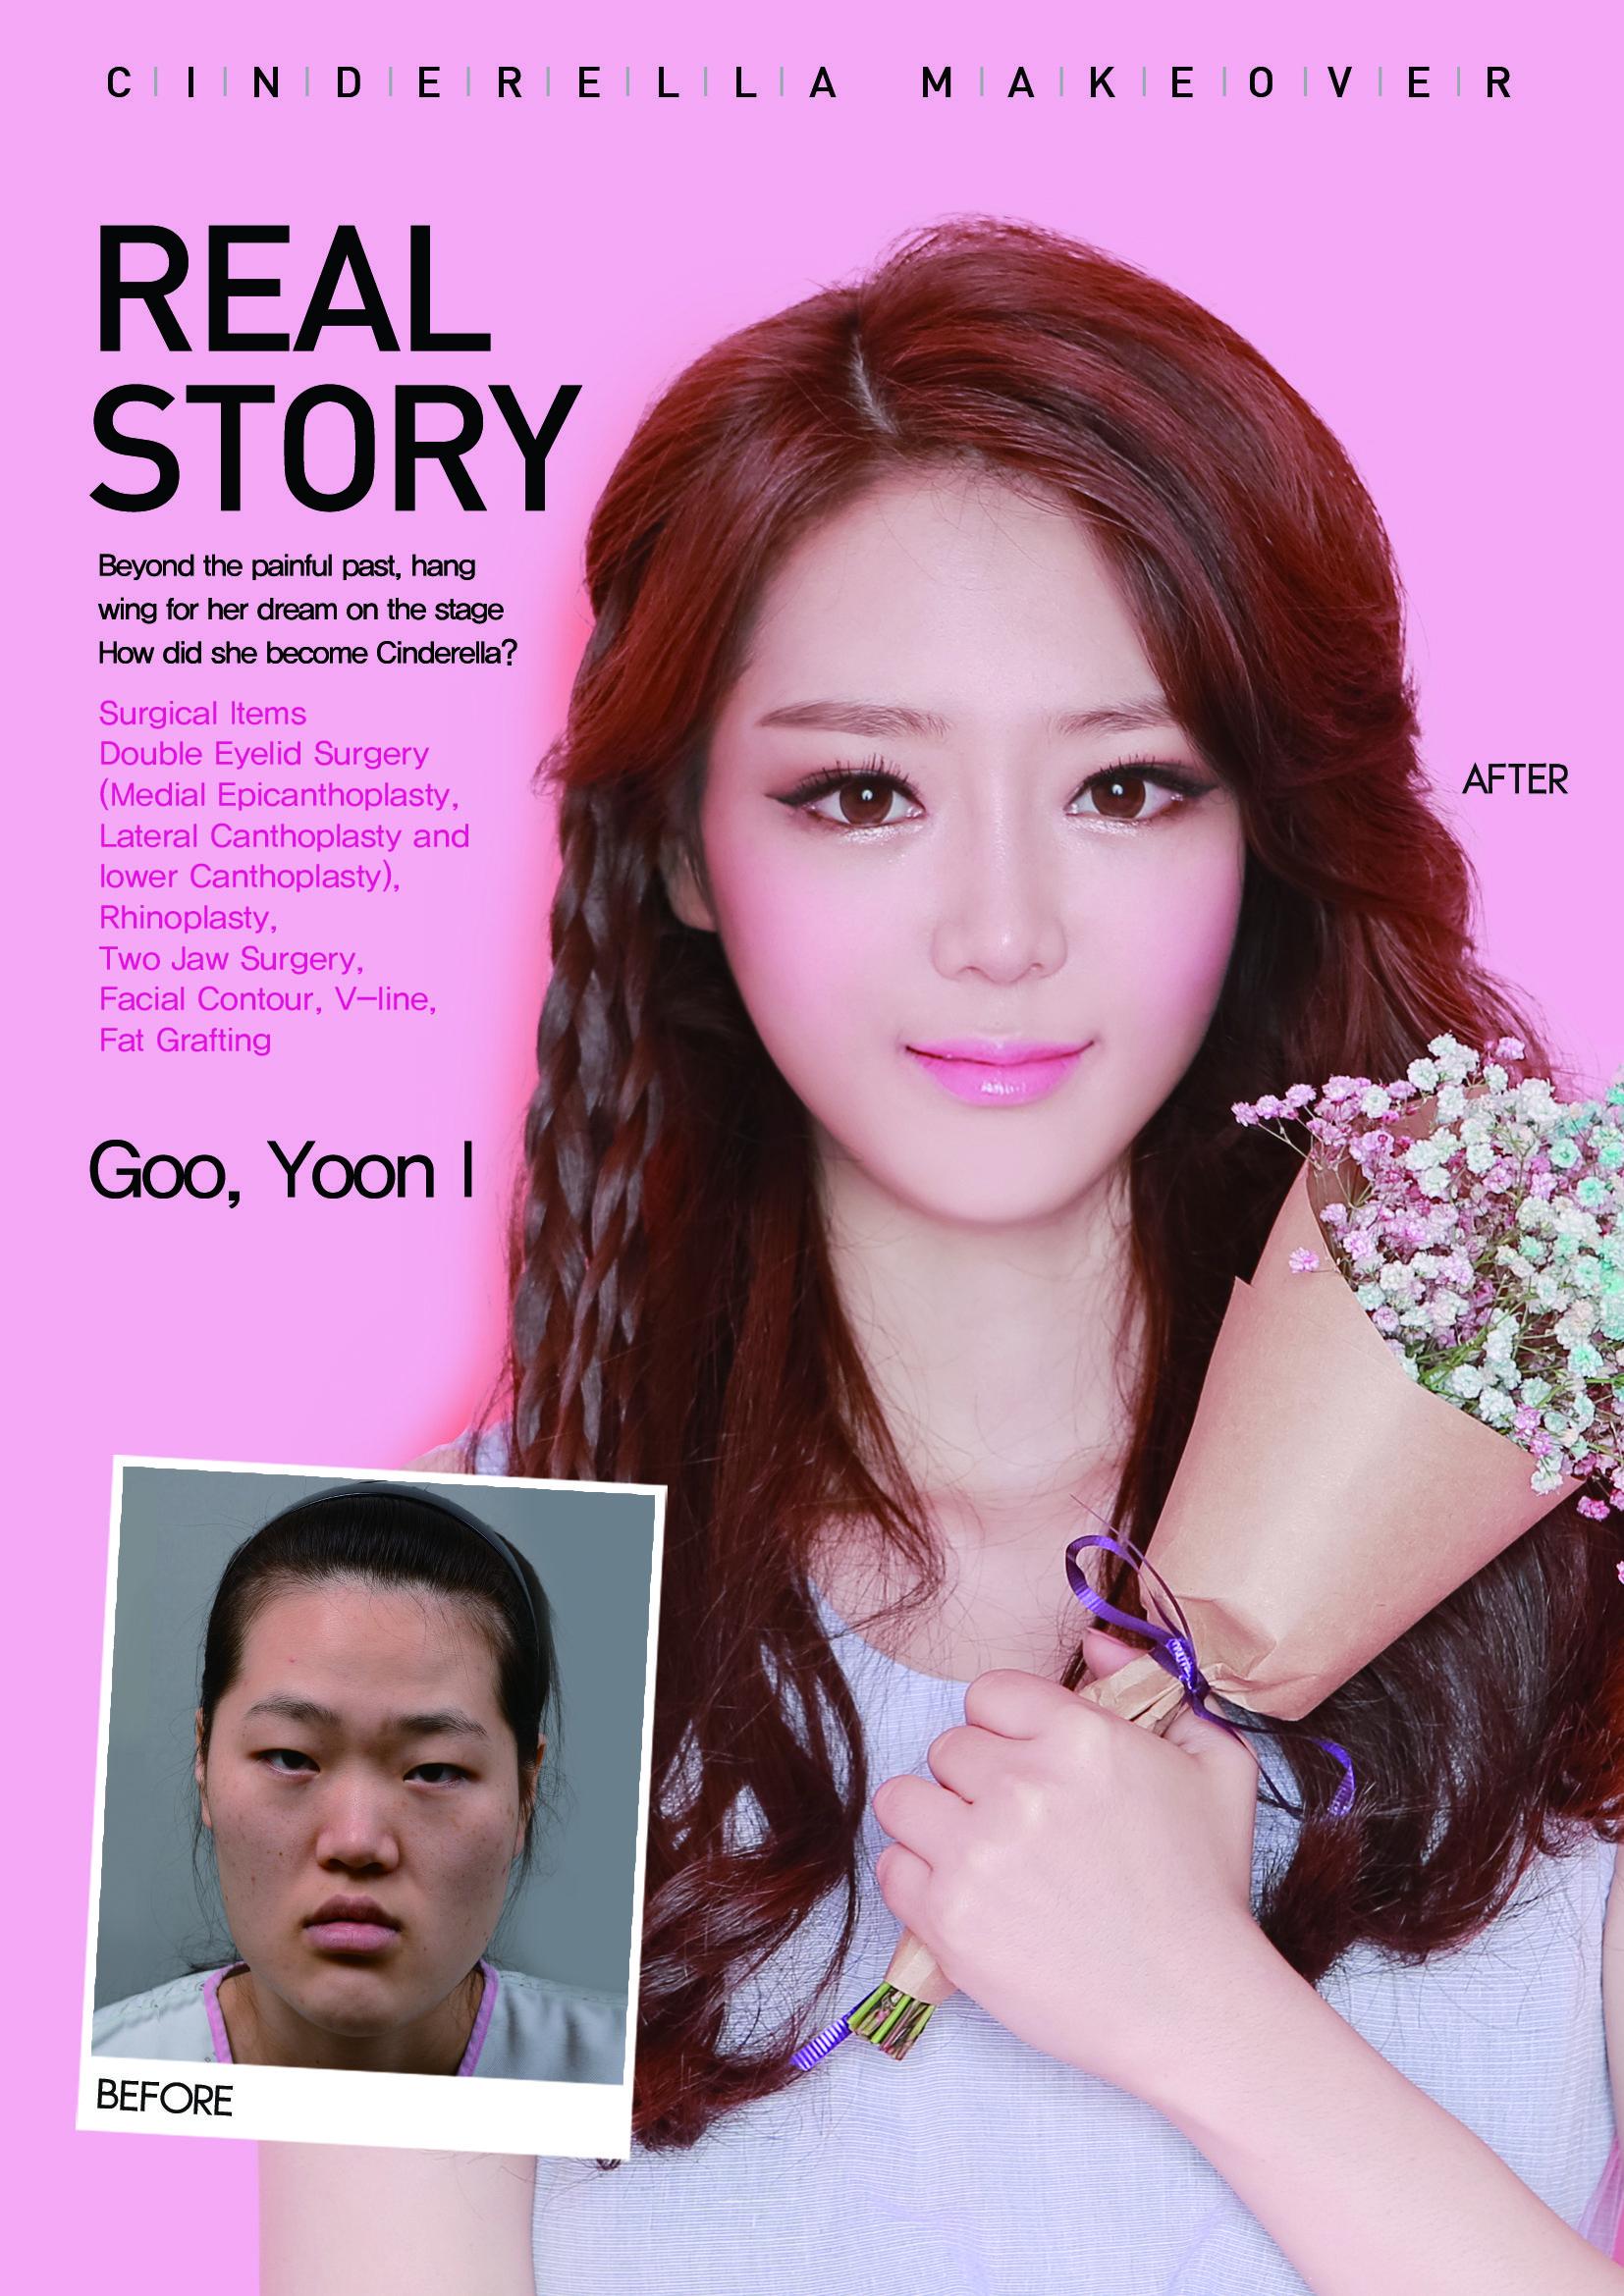 pin by cinderella plastic surgery korea on real story - goo, yoon i